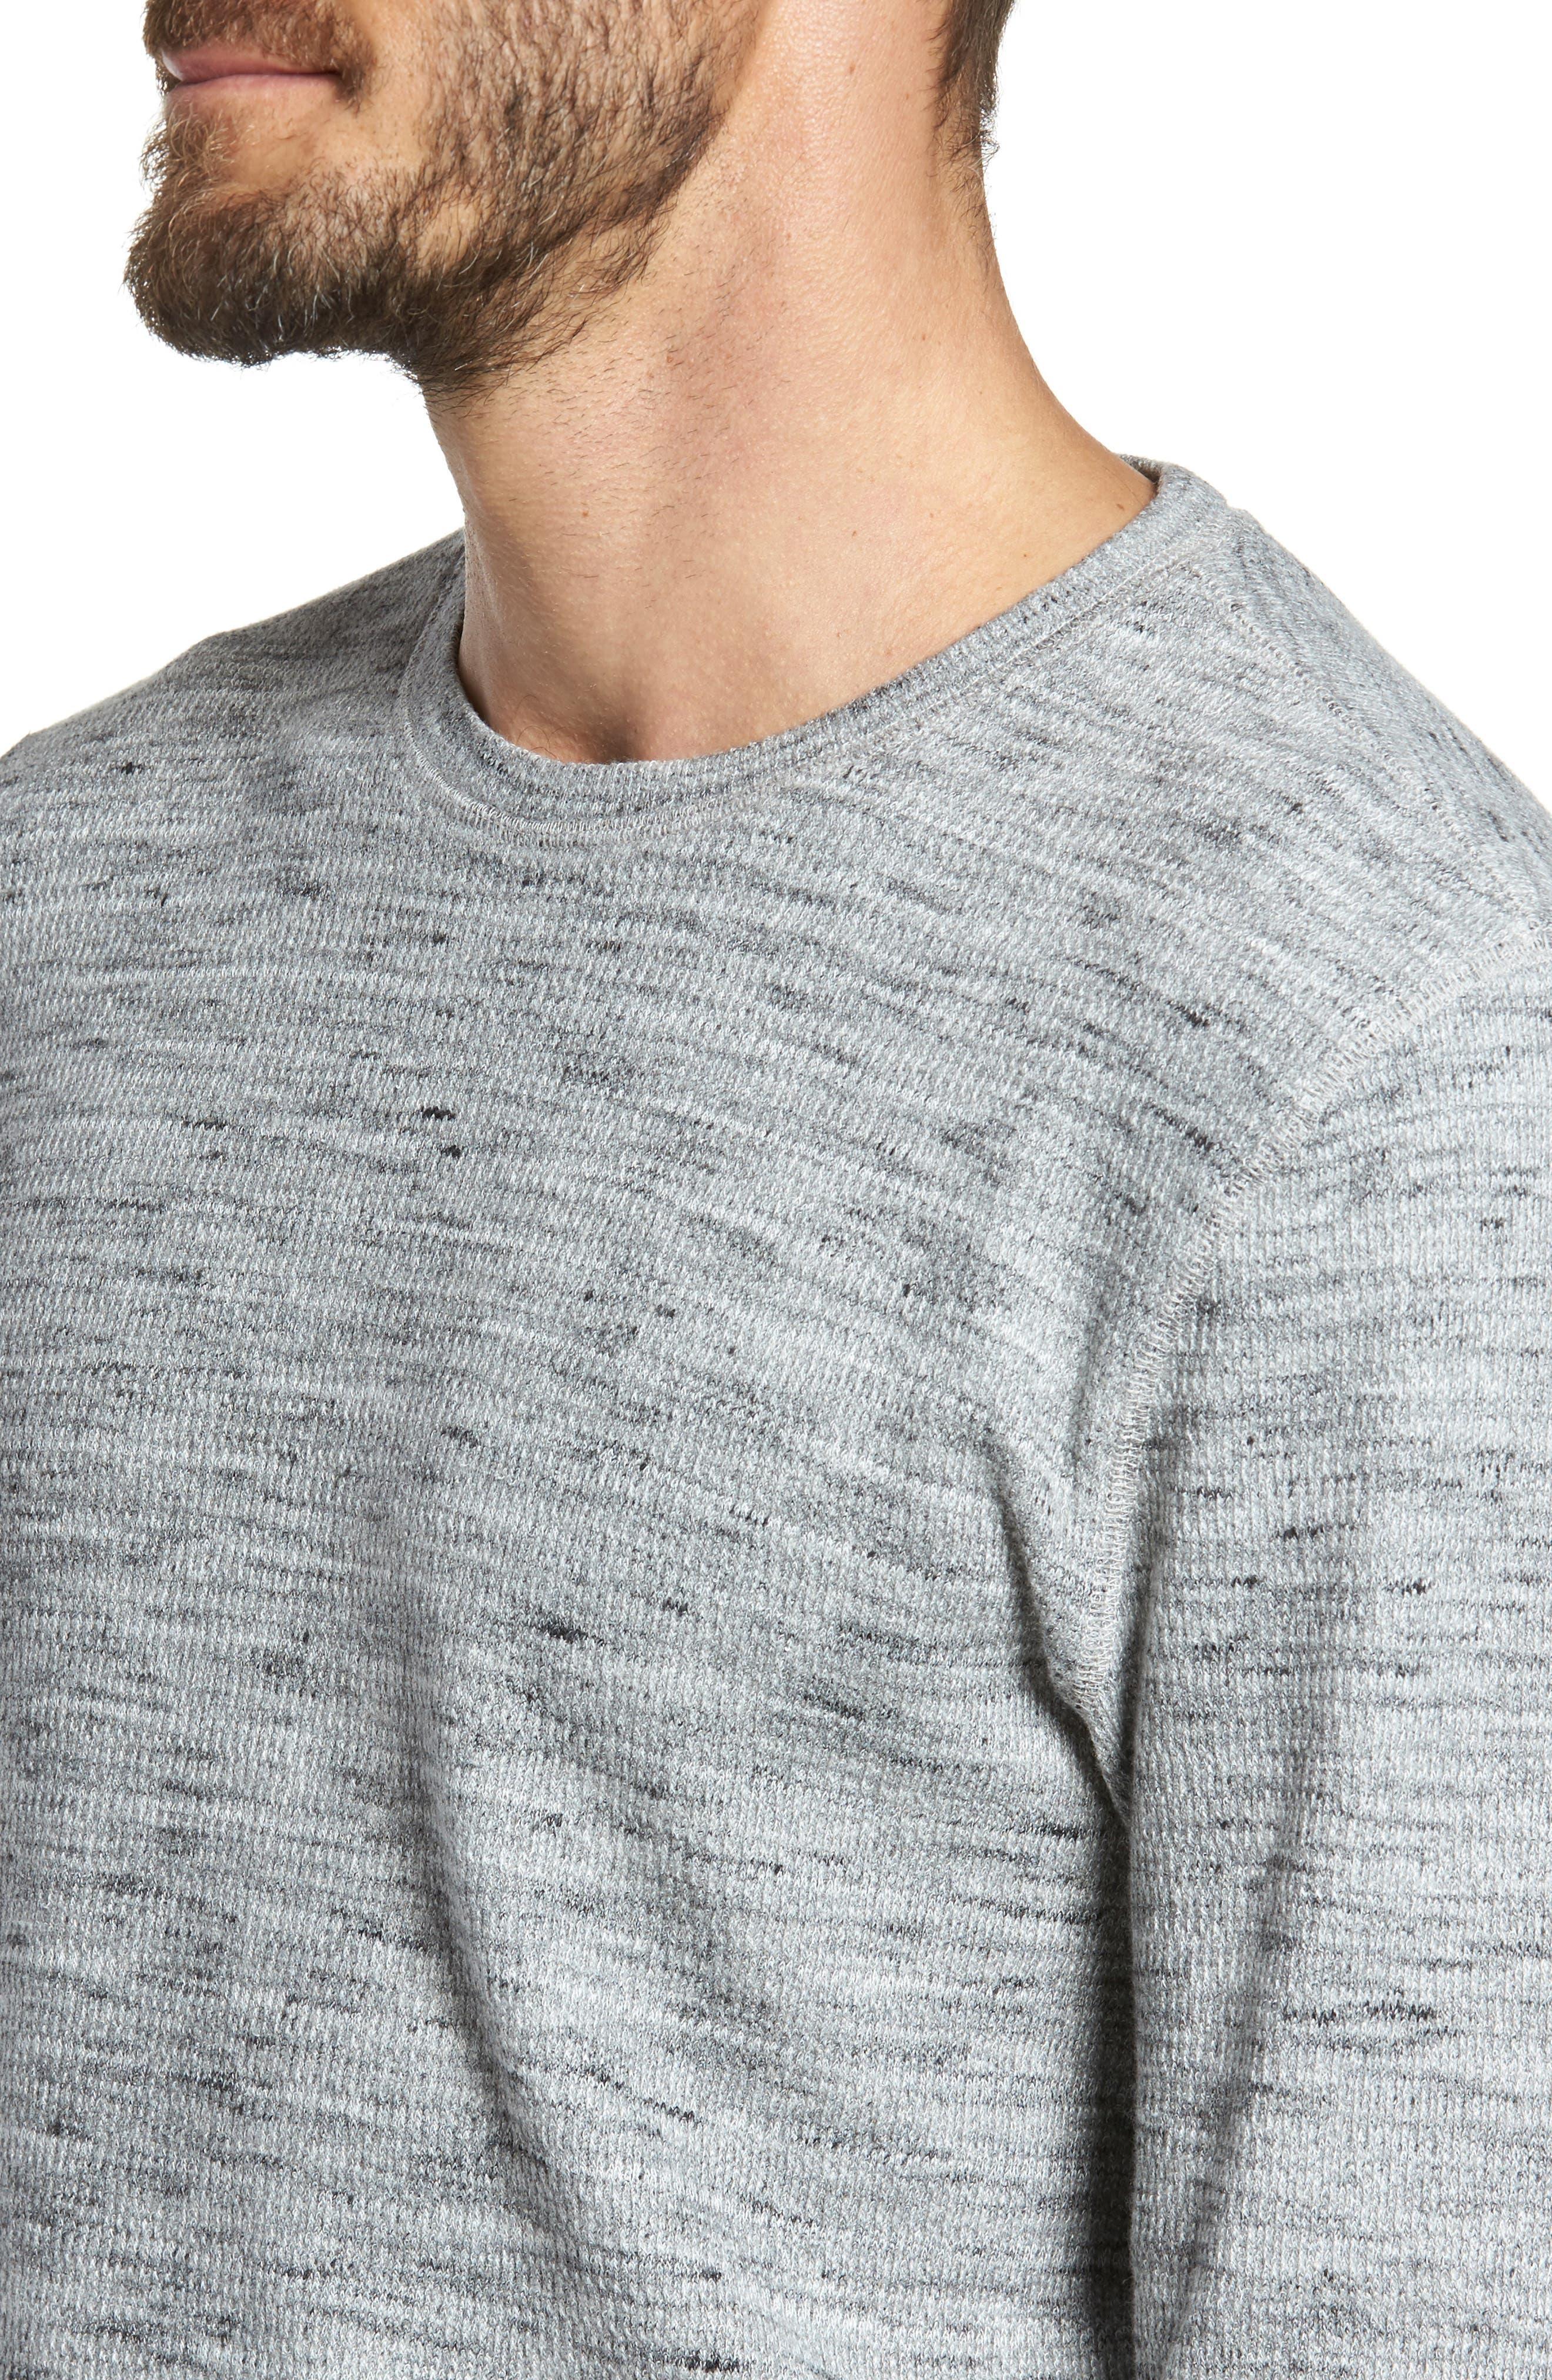 Waffle Knit Shirt,                             Alternate thumbnail 4, color,                             Grey Sleet Melange